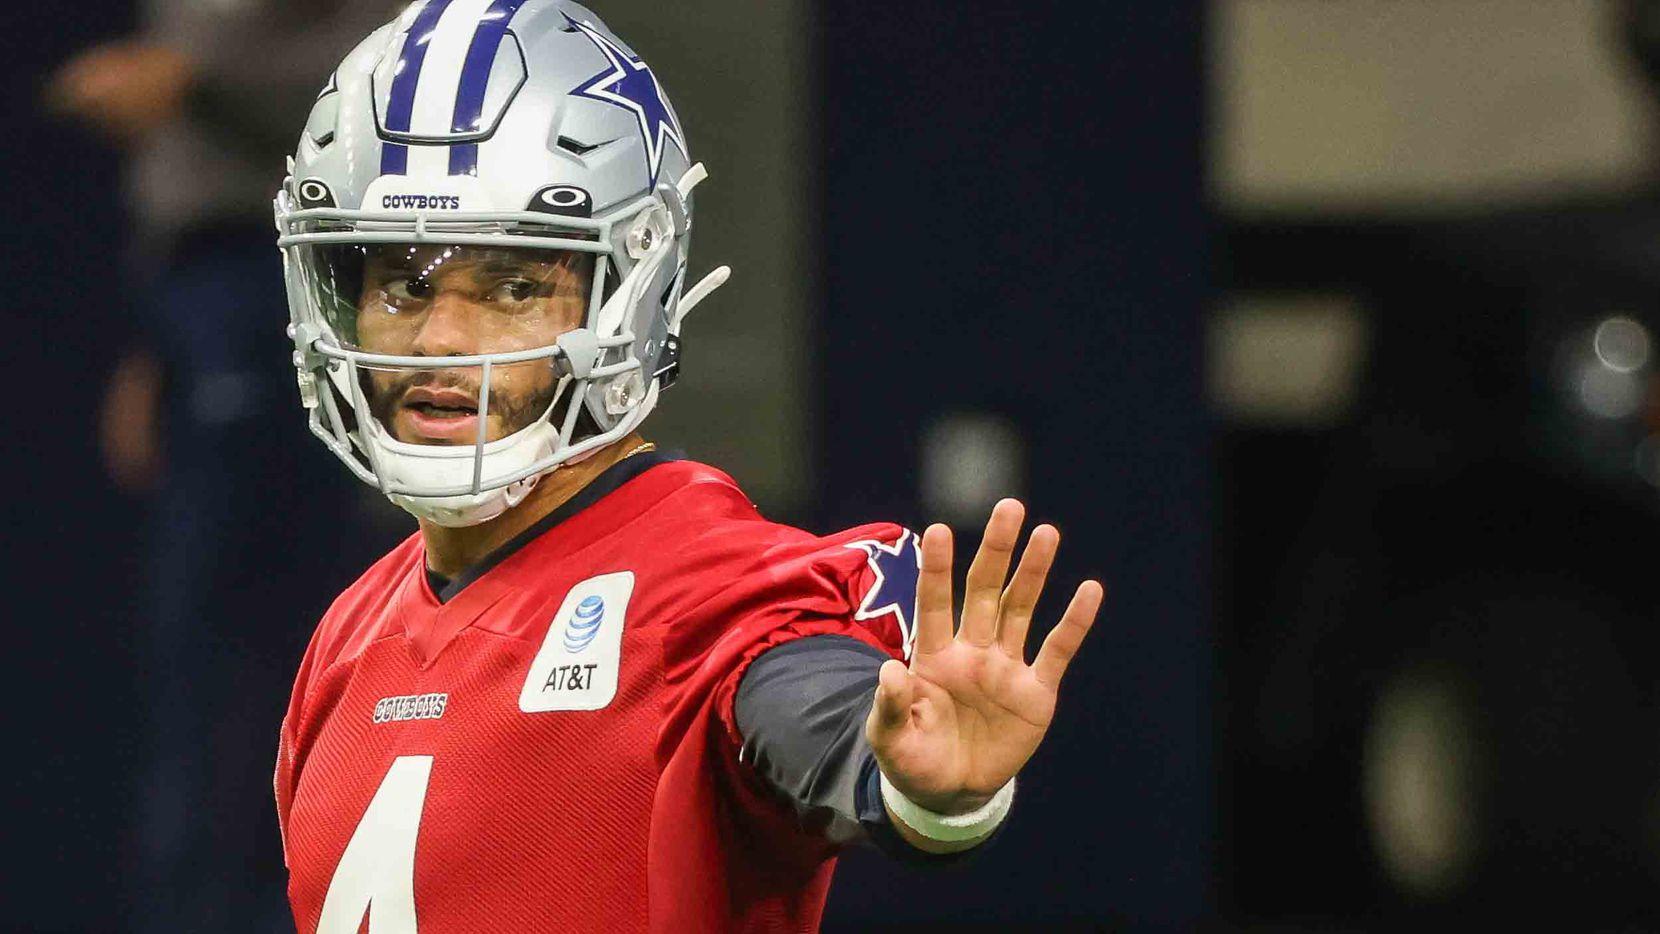 Cowboys OTA observations: Dak Prescott comfortable in drills; first look at  some defensive alignments